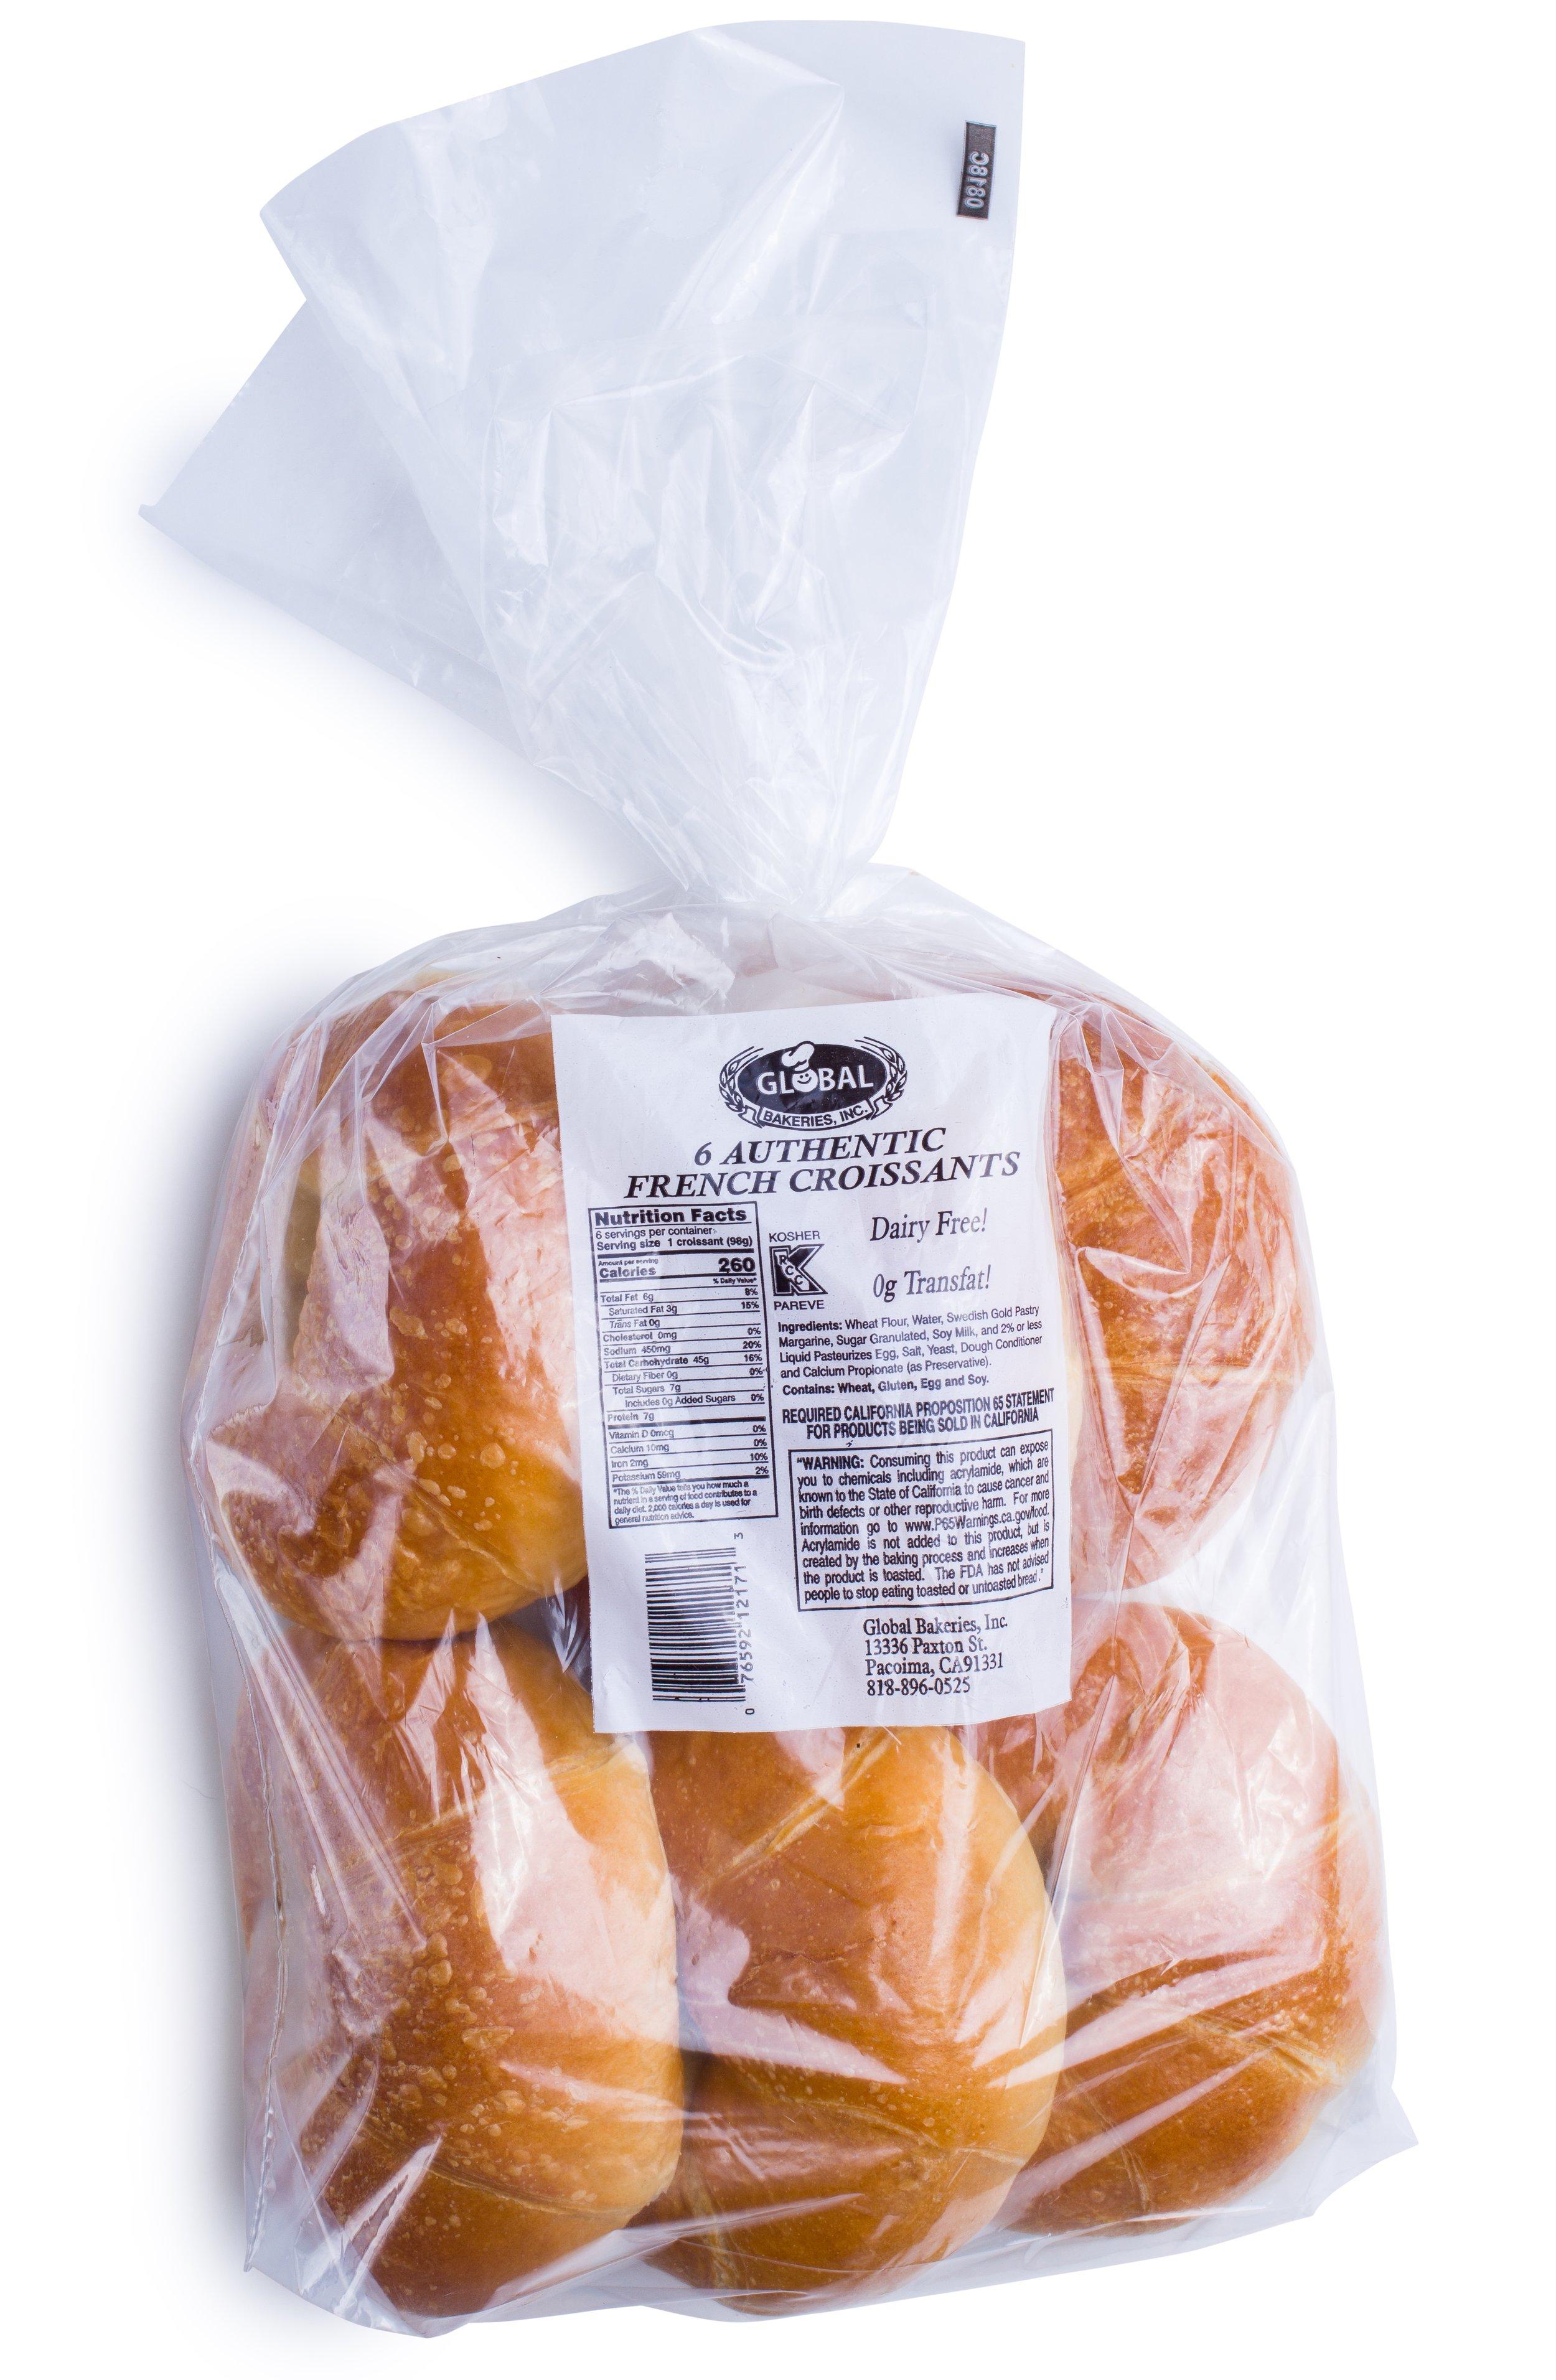 Croissants_packaged.jpeg